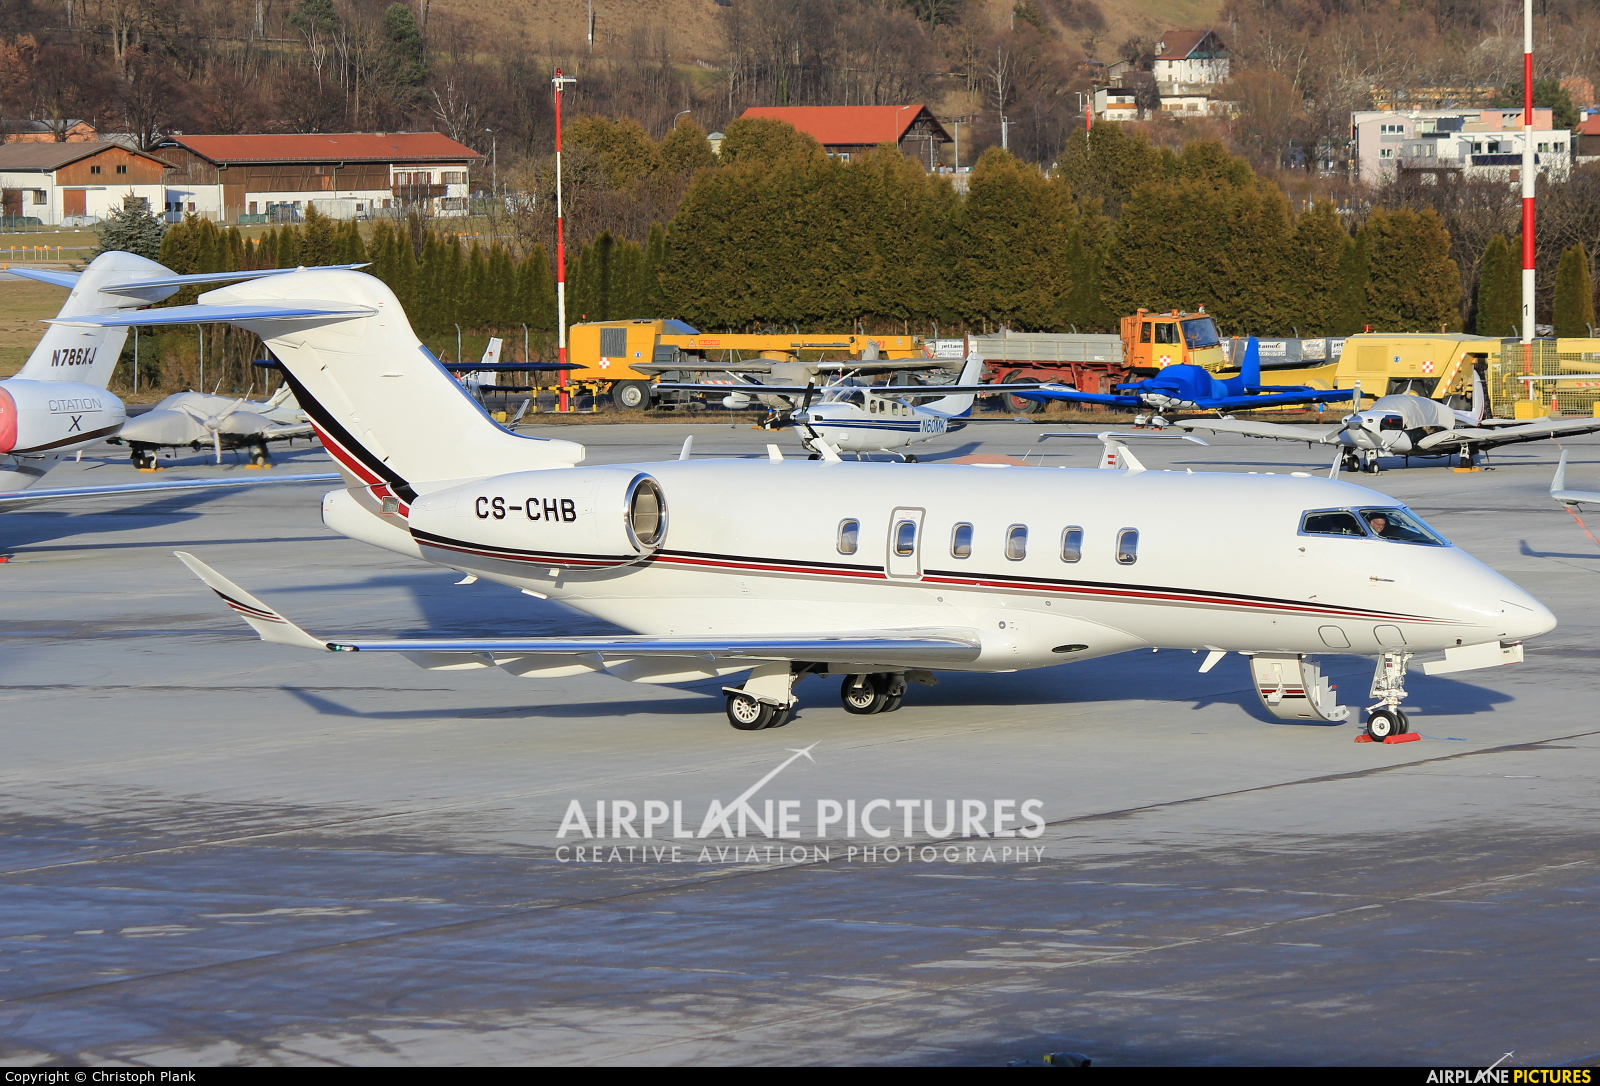 NetJets Europe (Portugal) CS-CHB aircraft at Innsbruck